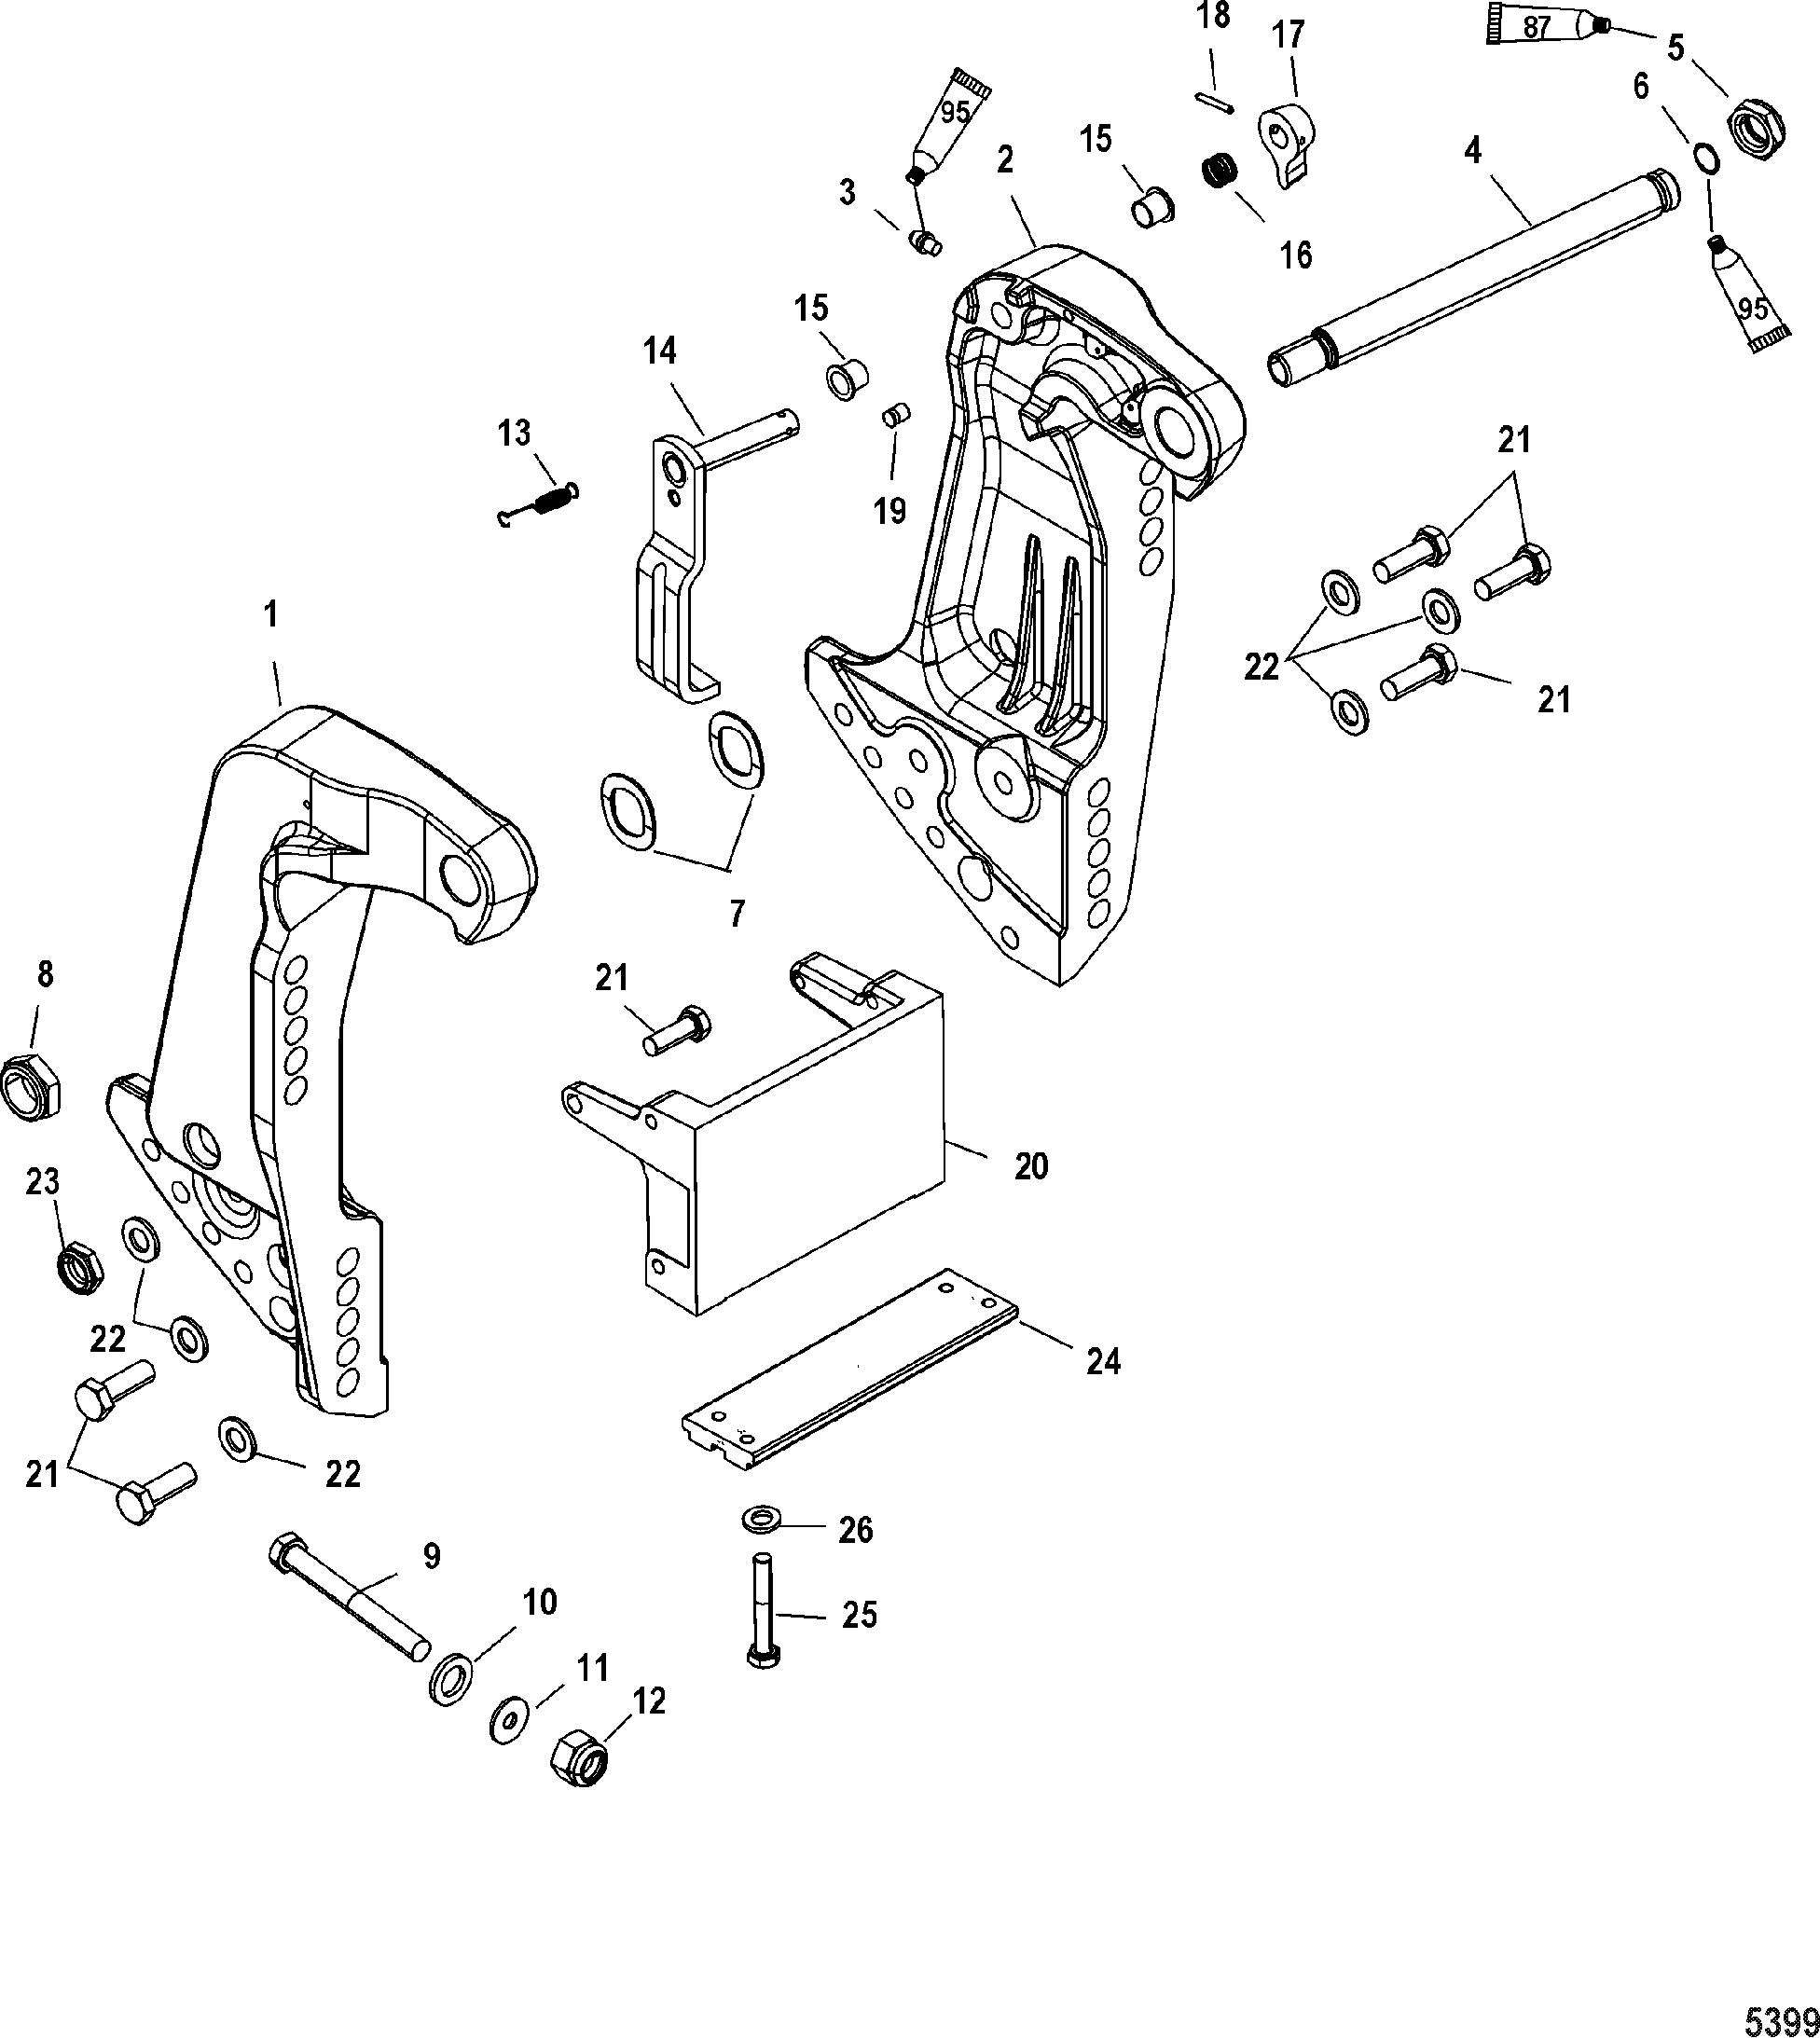 Transom Bracket S/N USA-0T800999/ Bel-0P267999 and Below